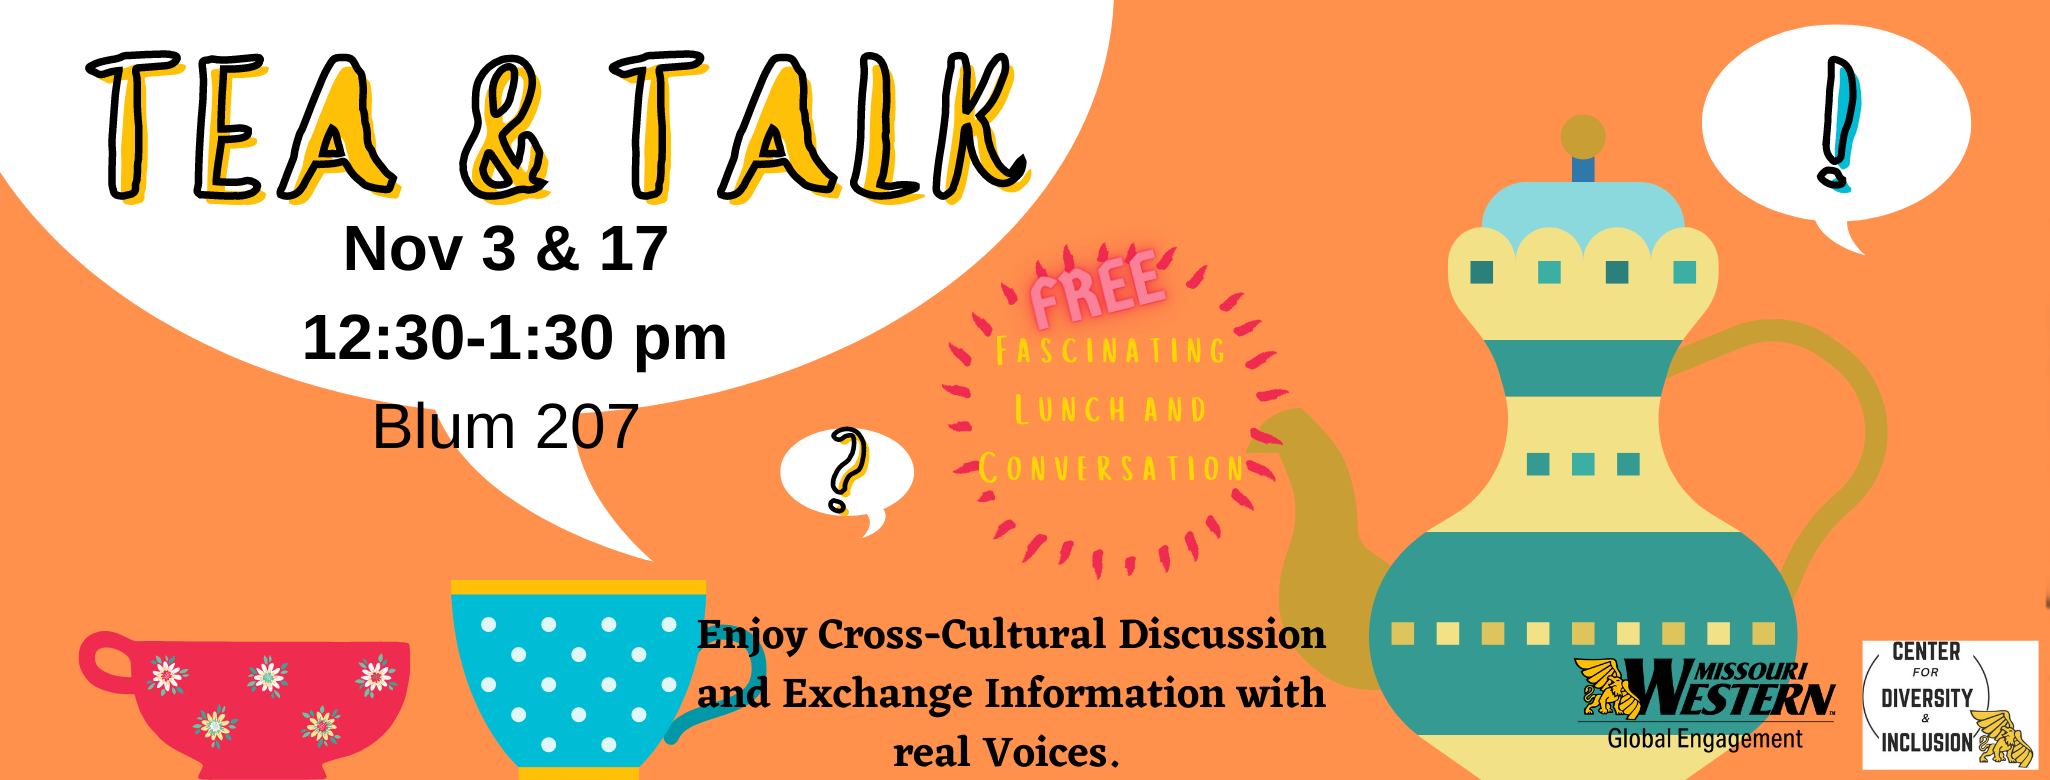 tea and talk event flyer